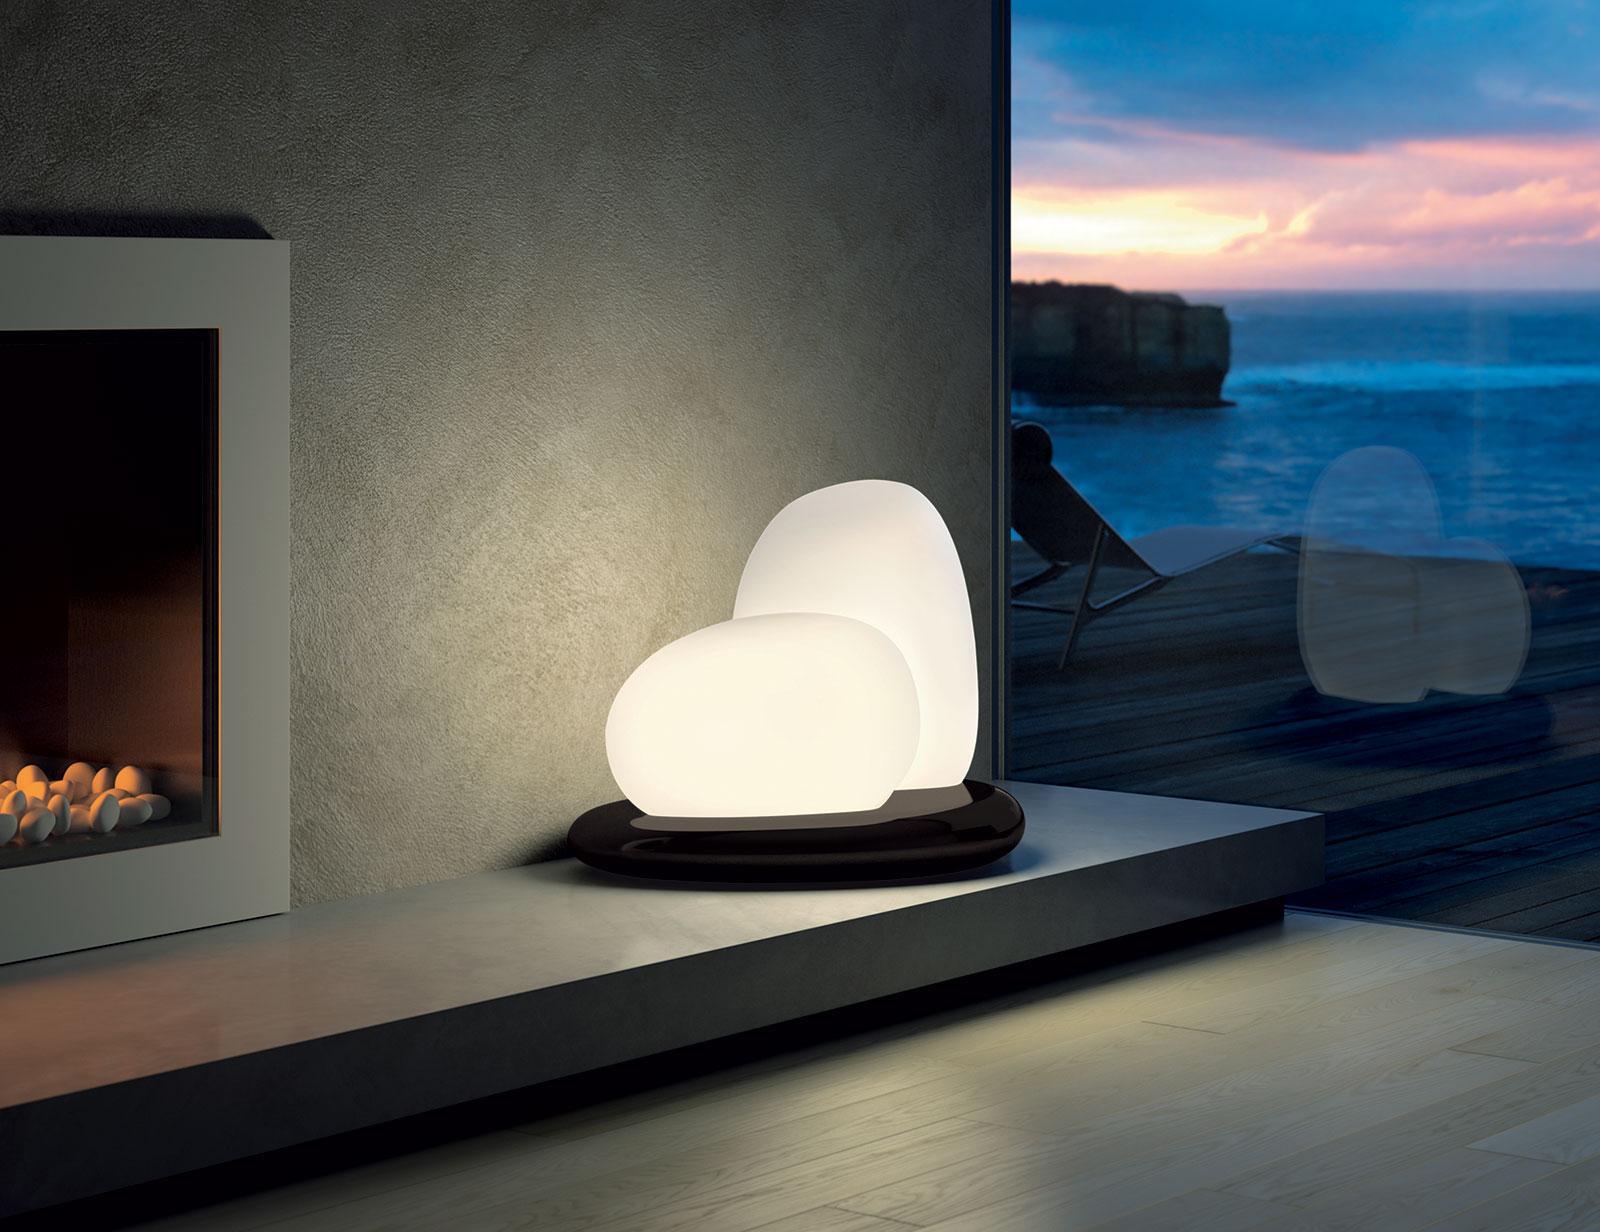 lampadario lampada sospensione design moderno acciaio cromo ...